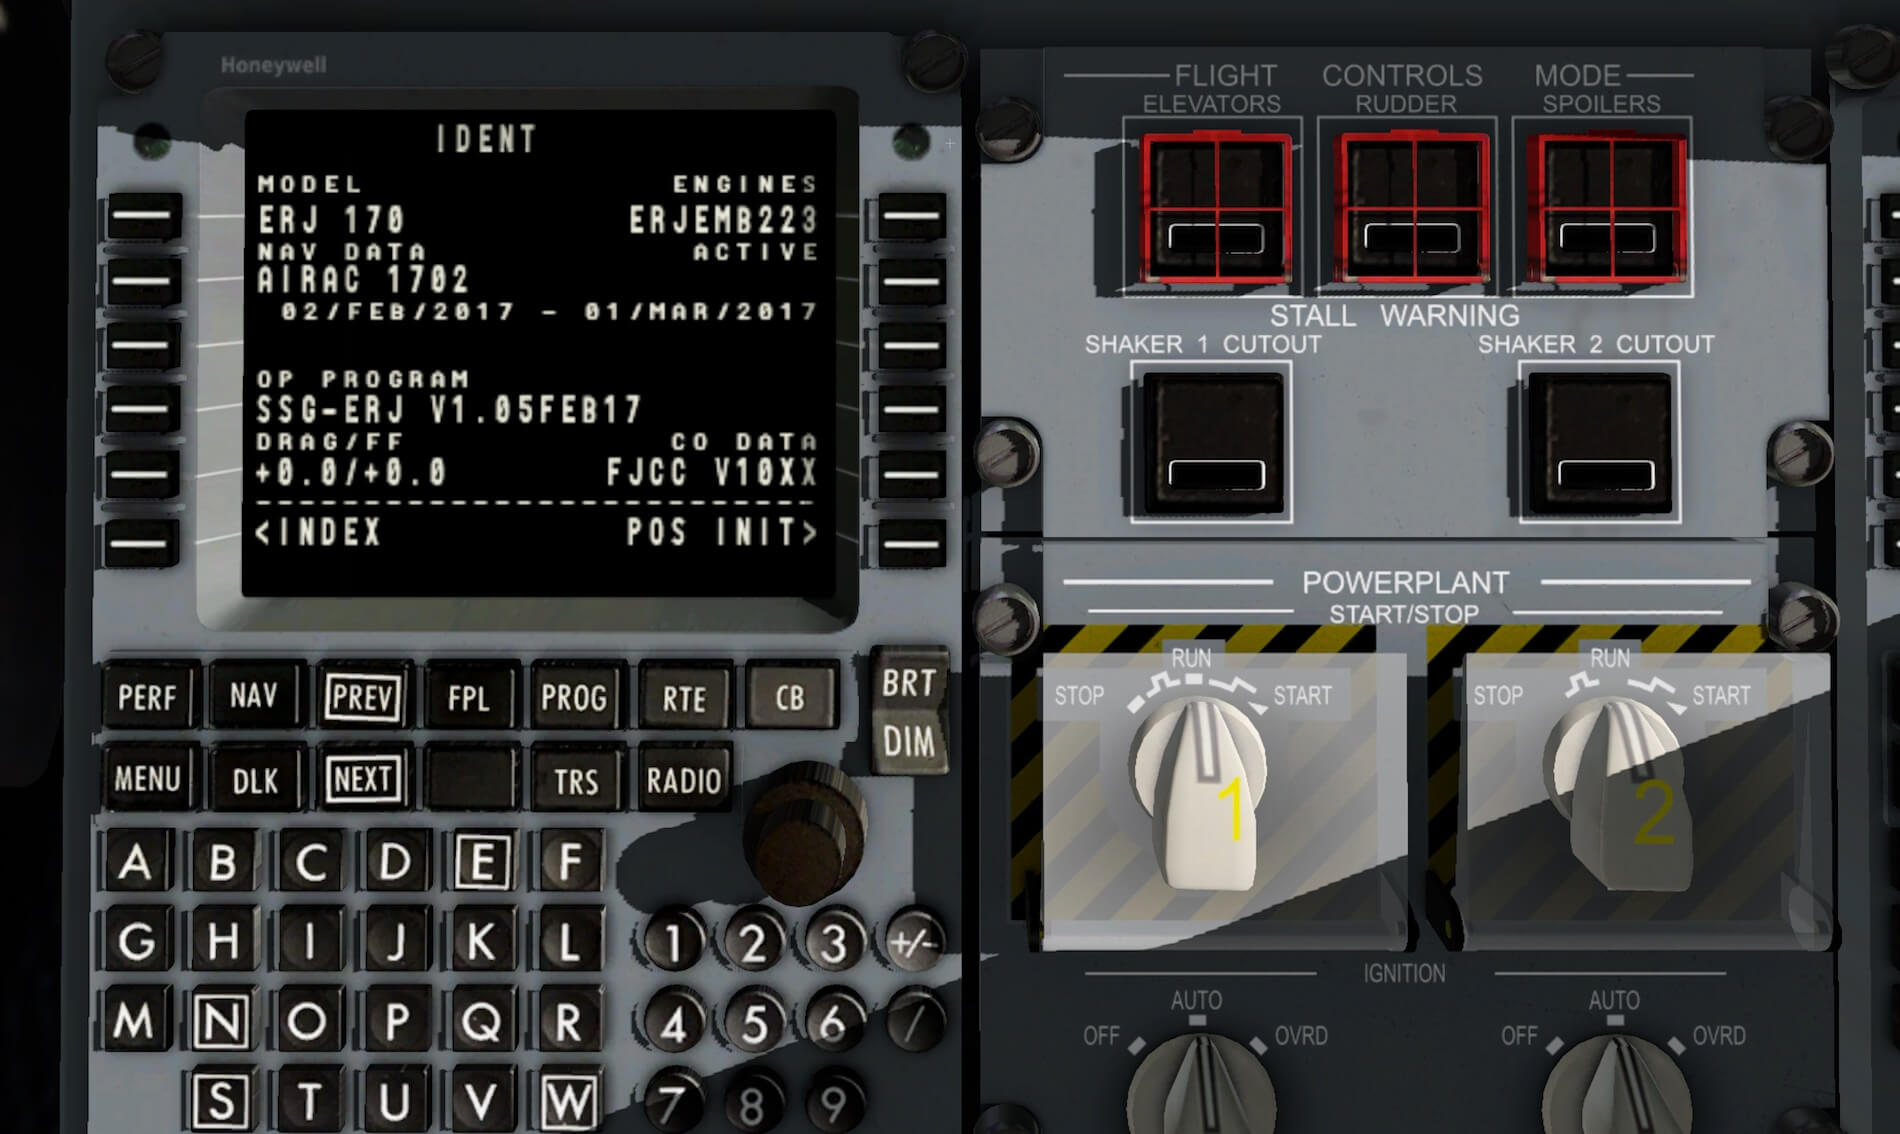 Review | SSG E-Jet Evo E-170 Series Part II | X-Plained, the Source